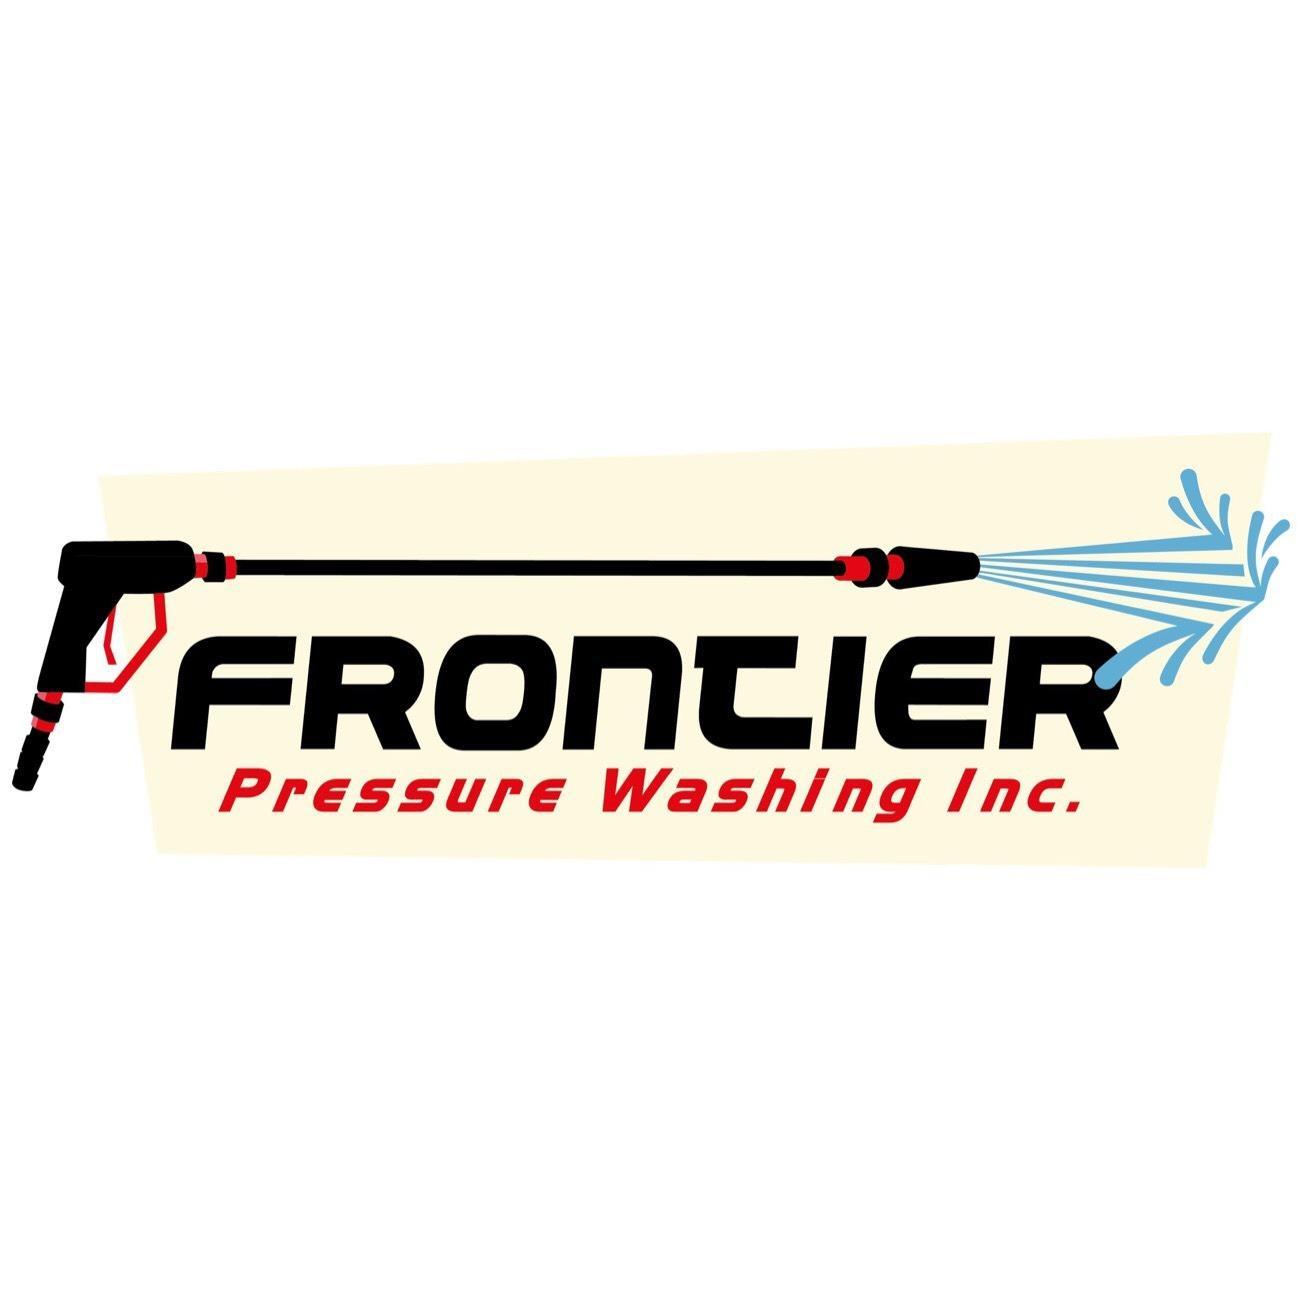 Frontier Pressure Washing Inc.